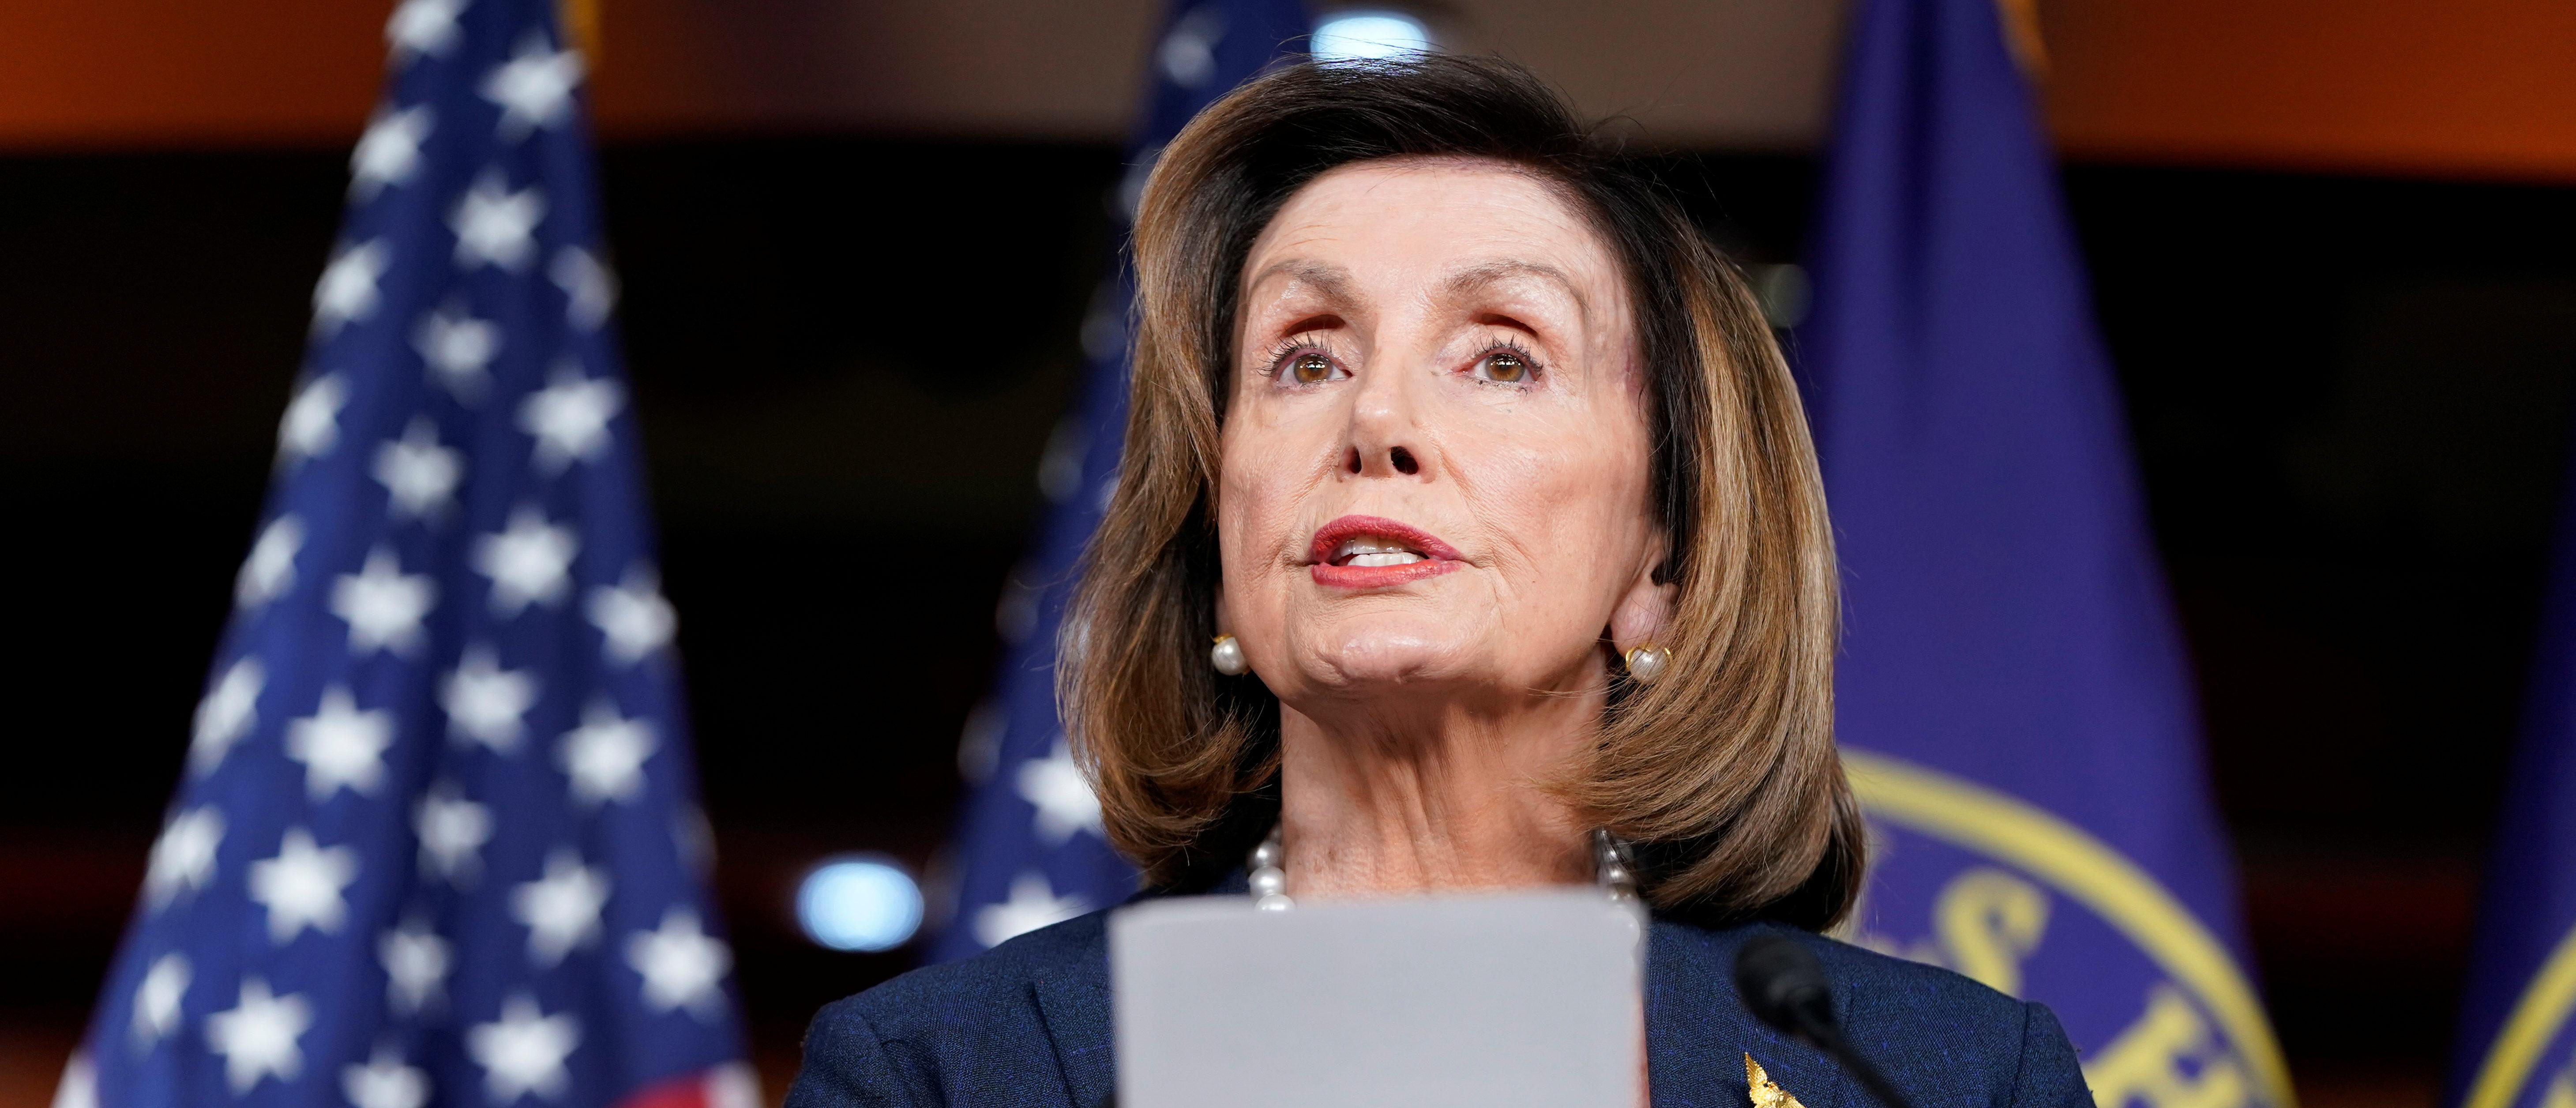 Nancy Pelosi Says House Democrats Will Vote To Block Trump's Travel Ban